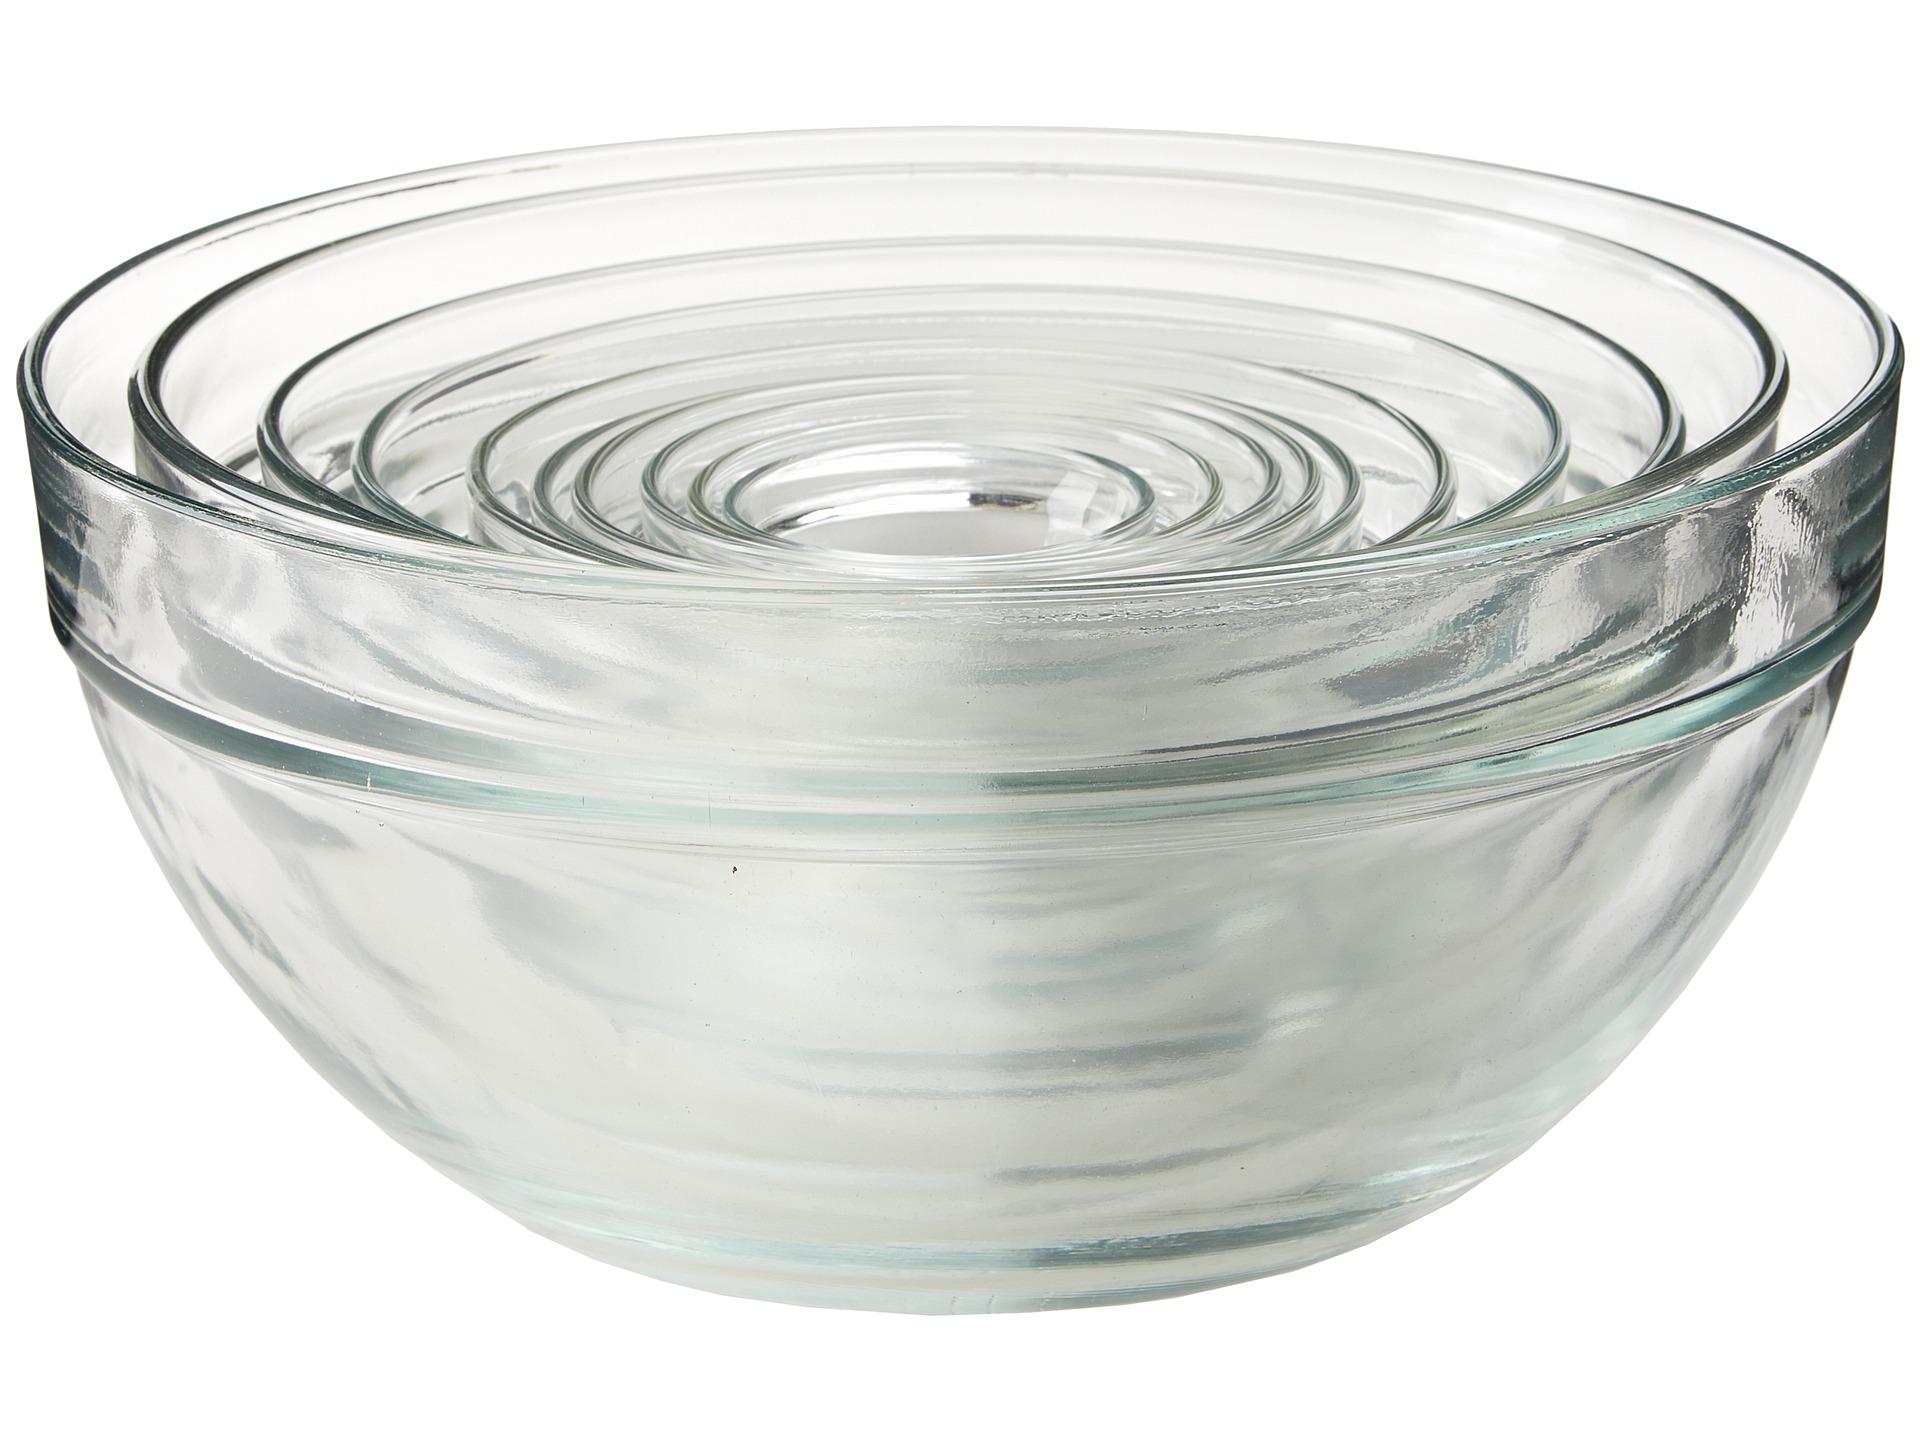 Artland piece glass mixing bowl set clear shipped